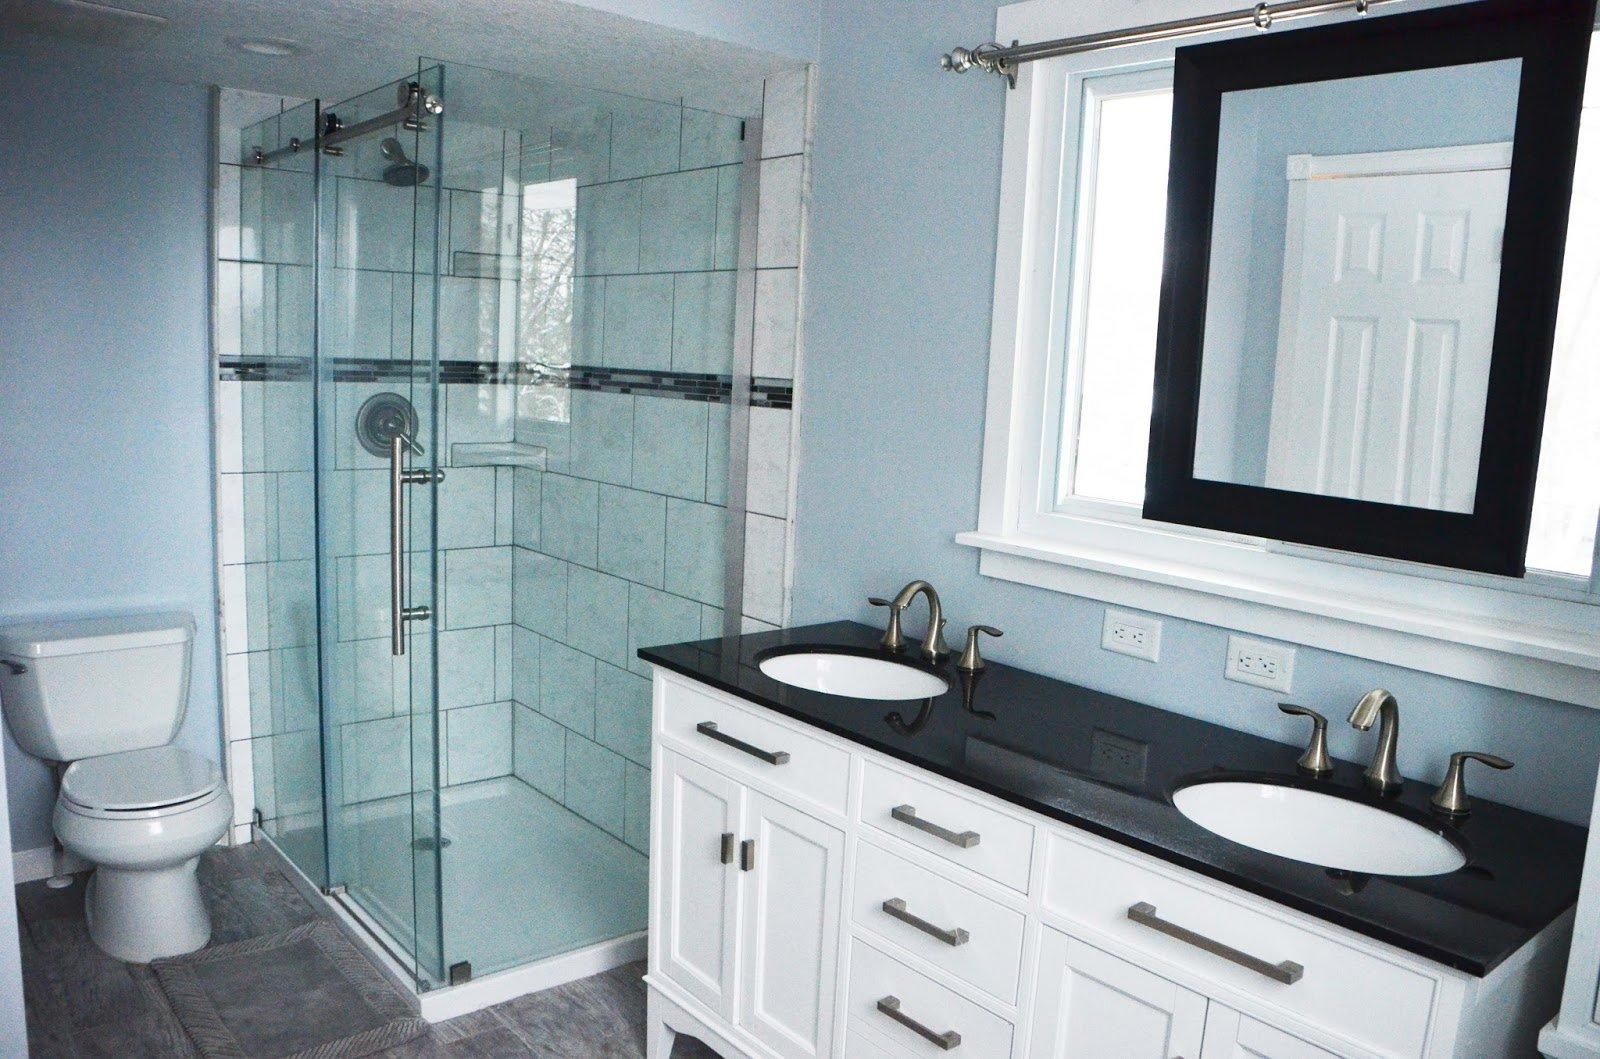 Bathroom Renovation With Sliding Mirror Over Window, Dark Vanity Countertop  Over White Vanity, By